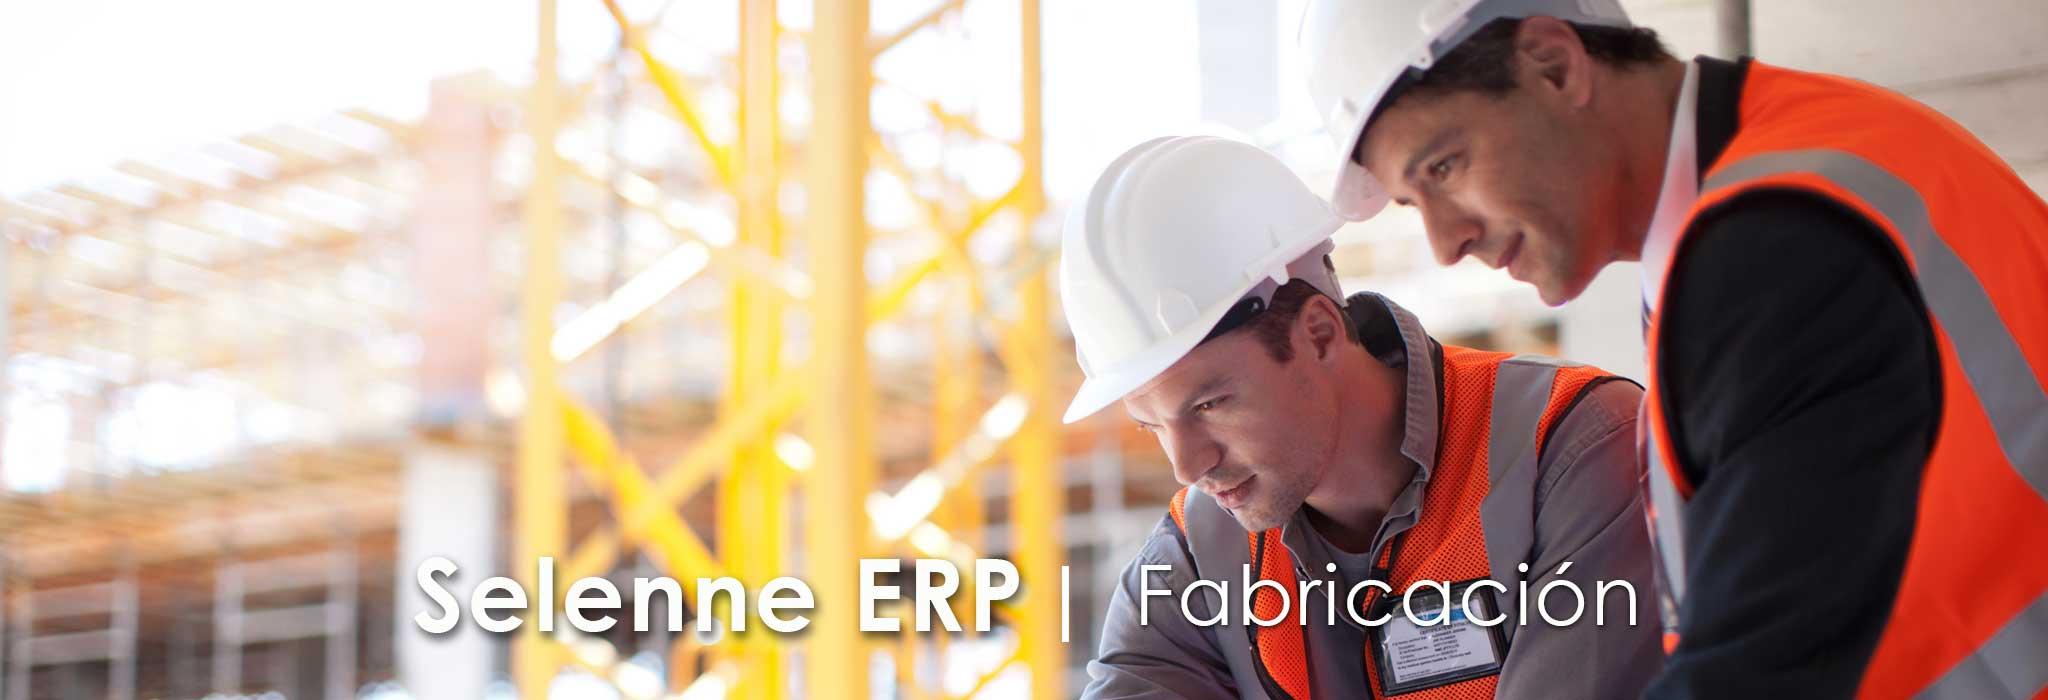 Selenne-ERP-Fabricacion